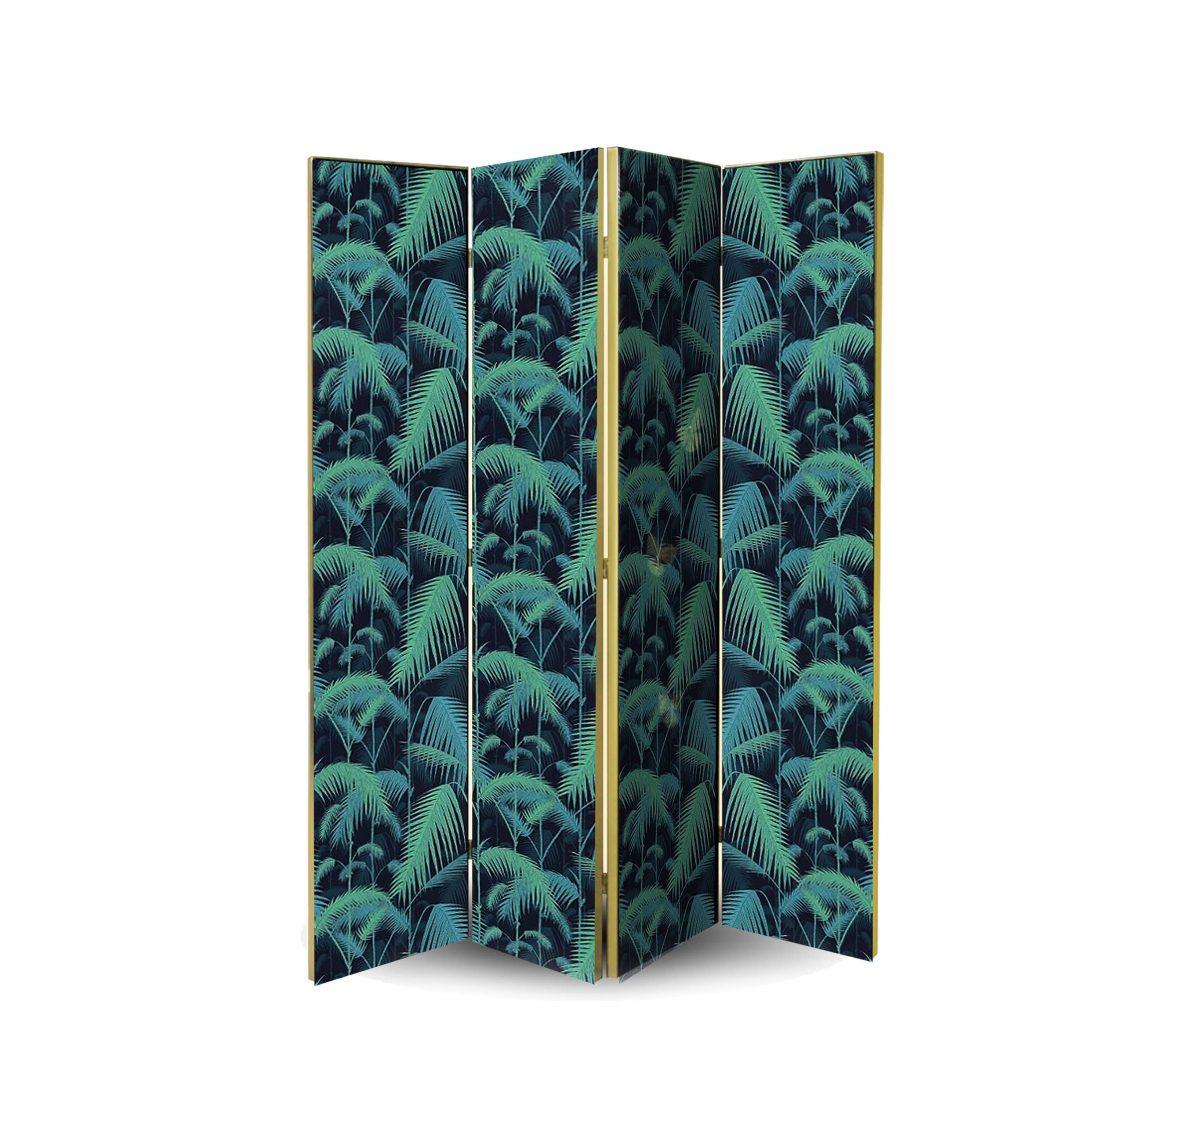 7. Tropical screen by DesignByGemini